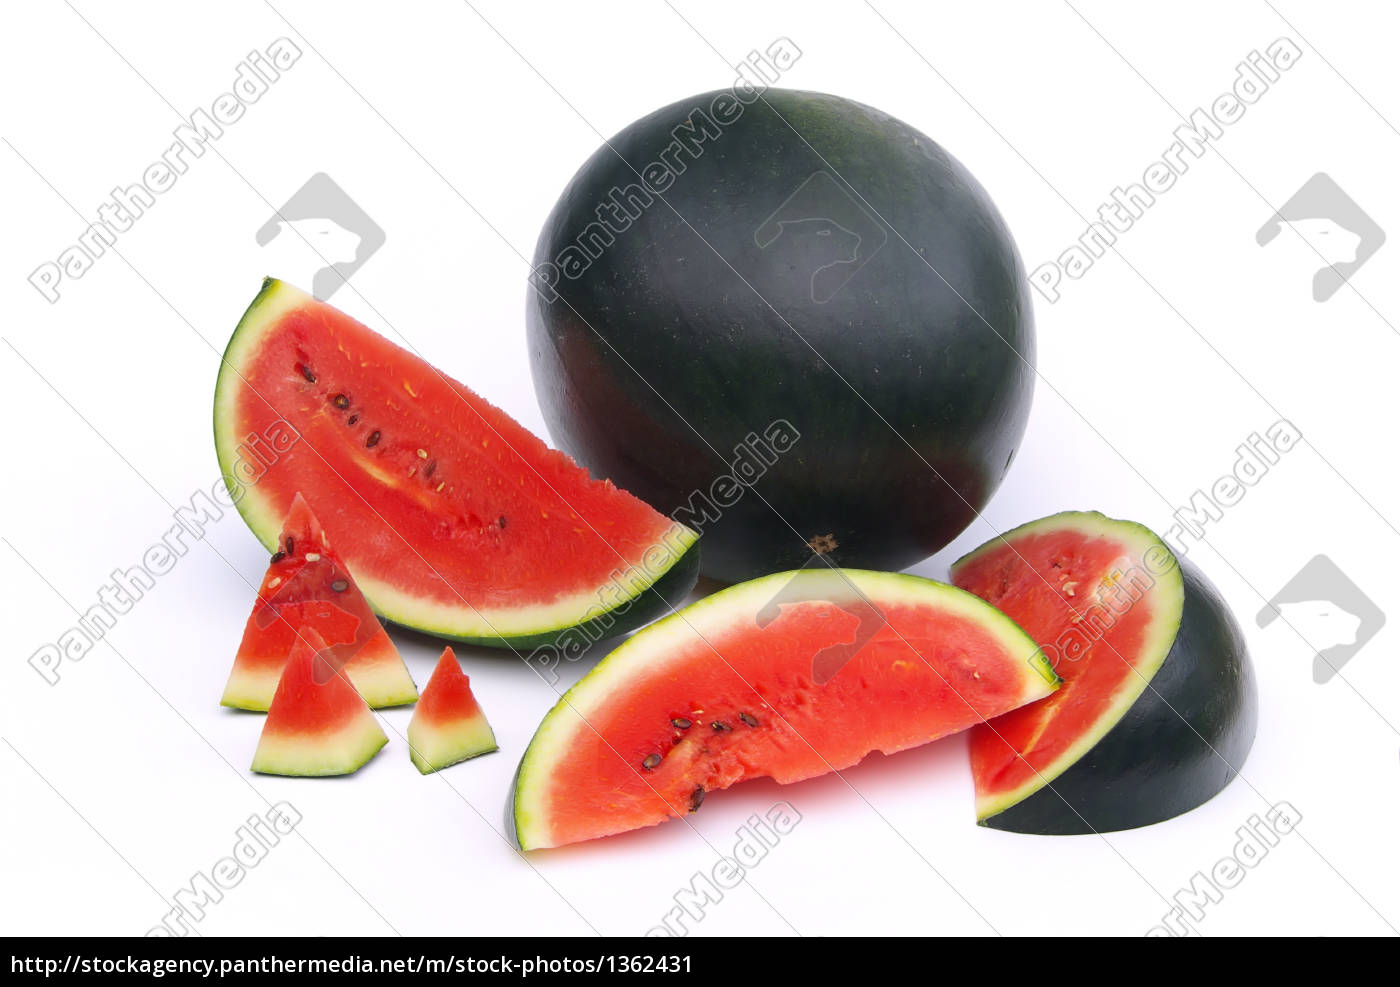 melon, 04 - 1362431